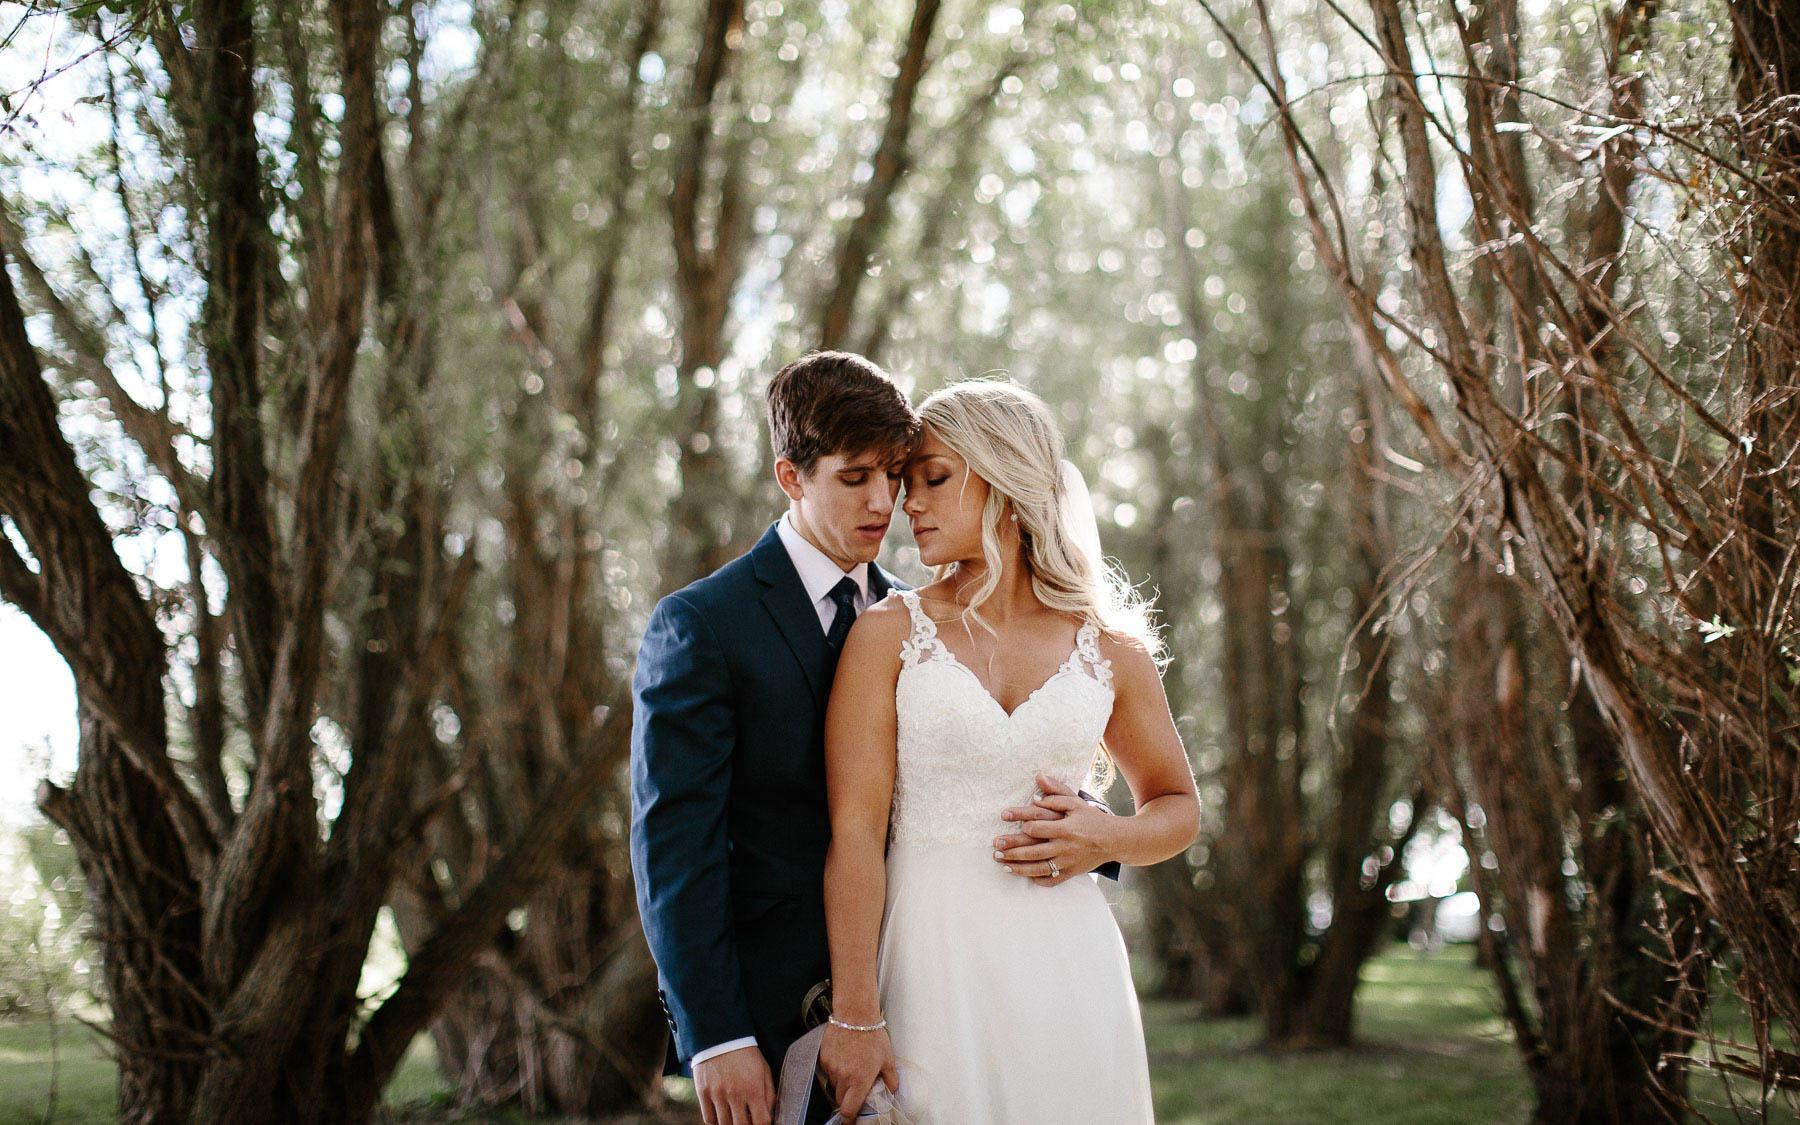 Intimate_Farmhouse_SD_Wedding_Bridgette_Philip_049.jpg